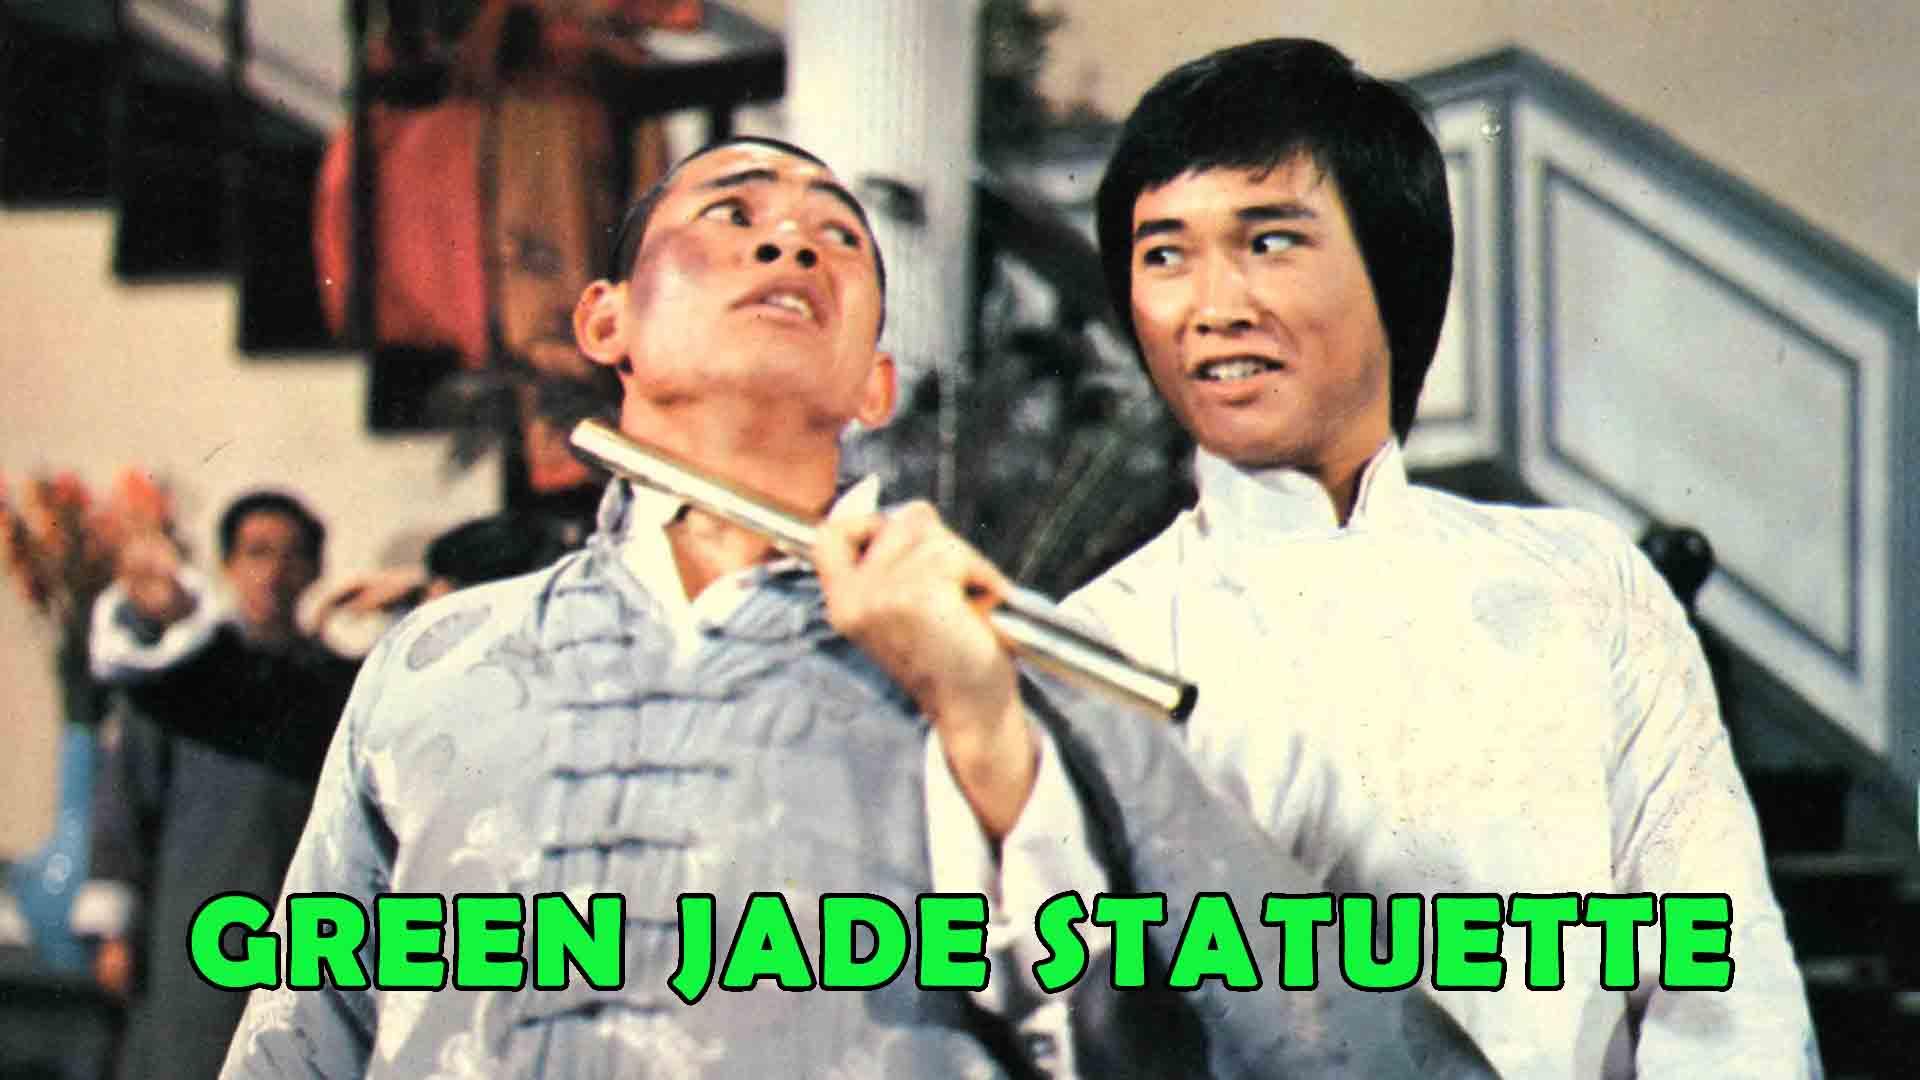 Green Jade Statuette